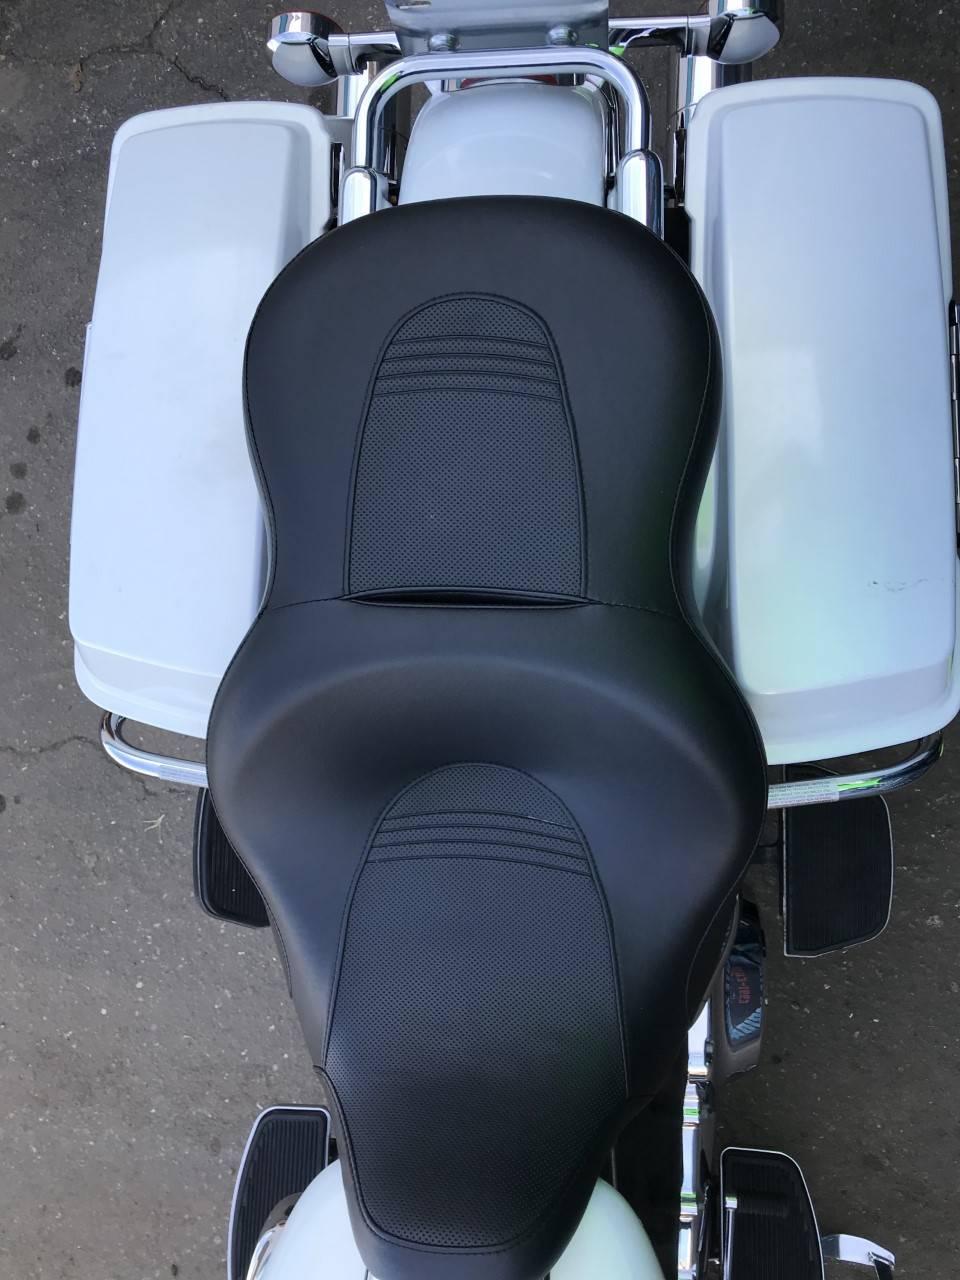 2008 Harley-Davidson FLHR 7